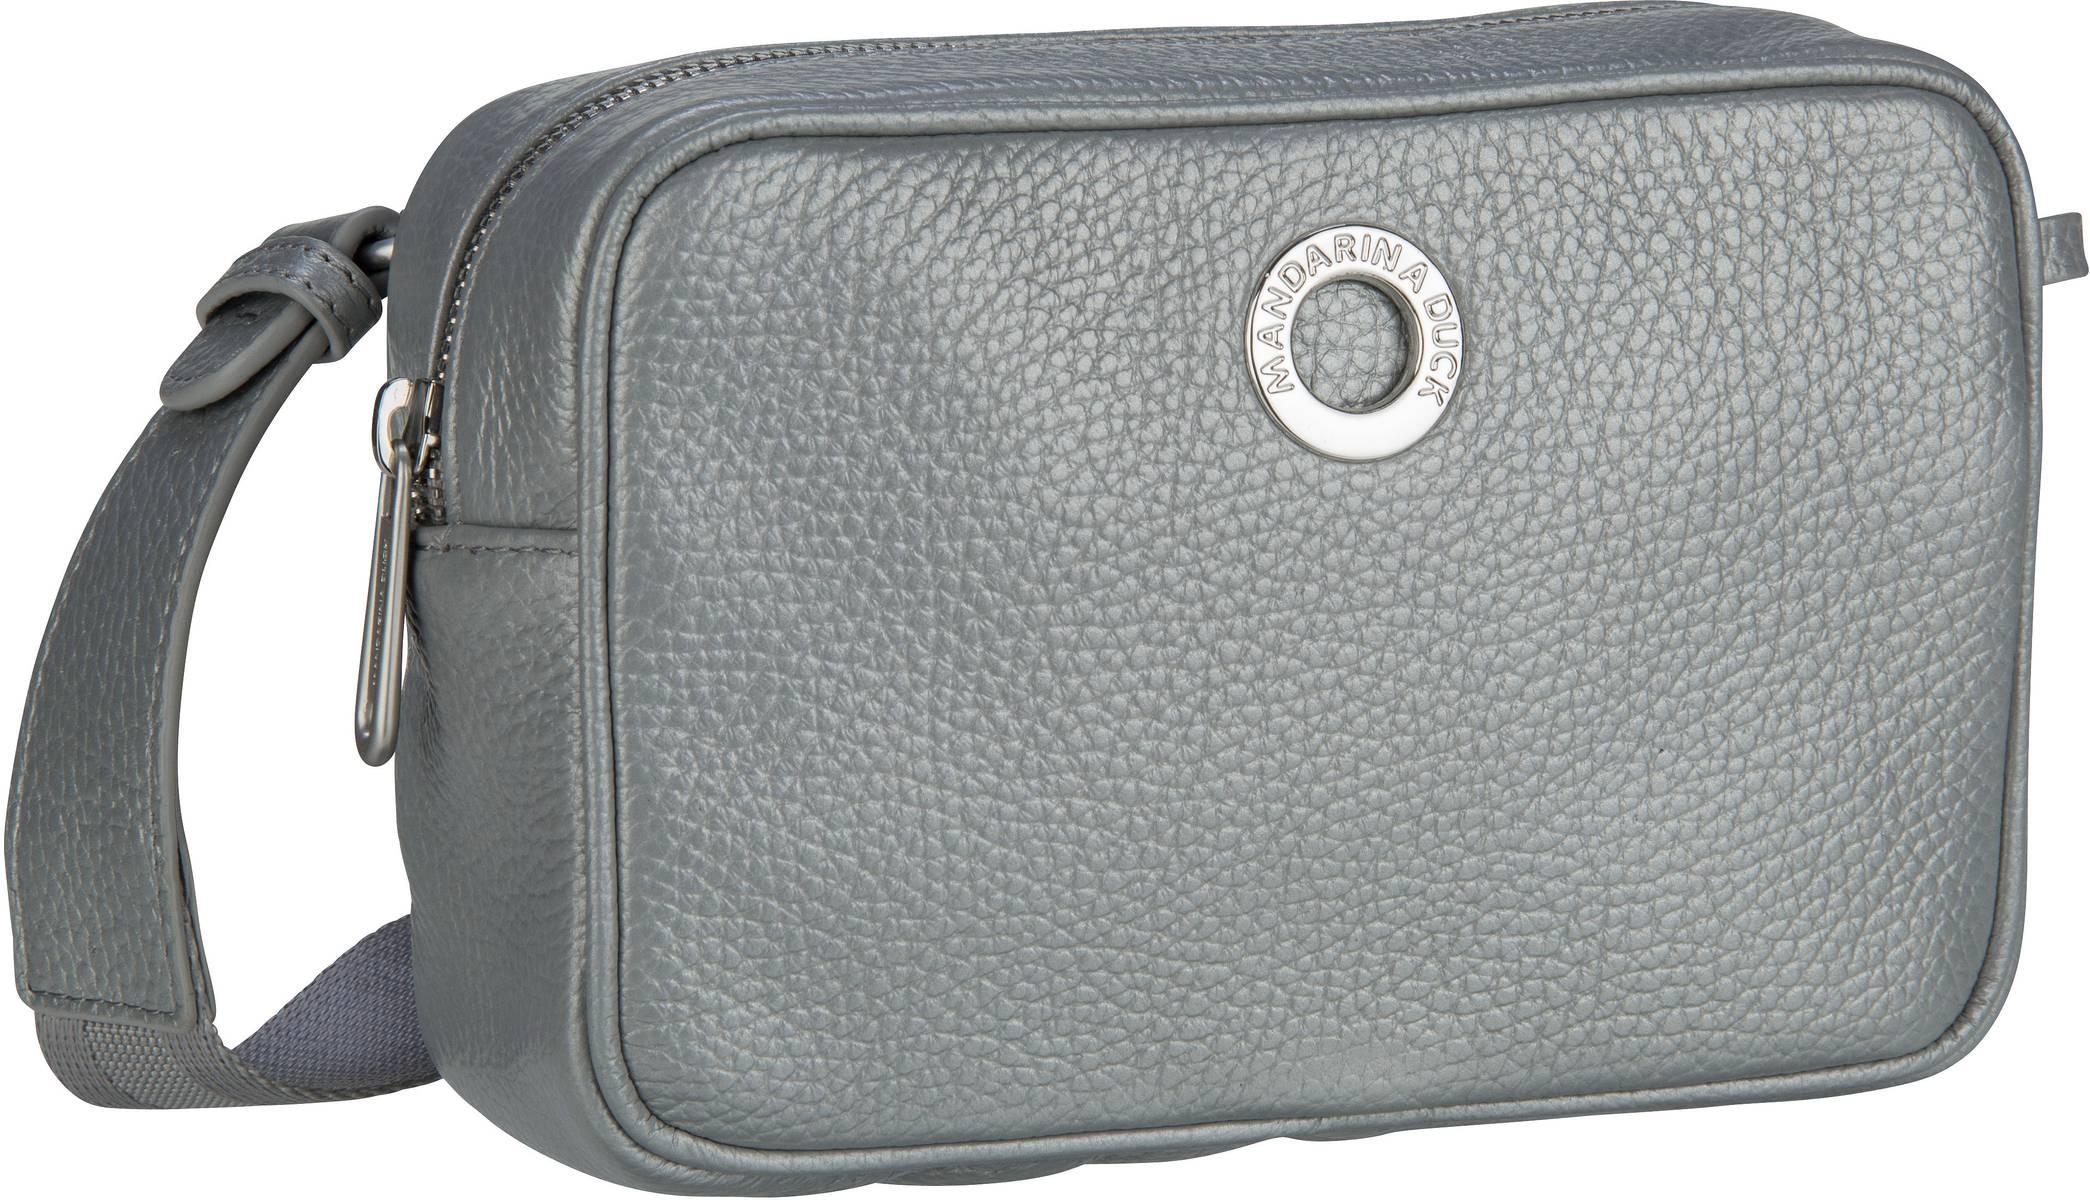 Umhängetasche Mellow Leather Lux Camera Bag ZLT22 Silver